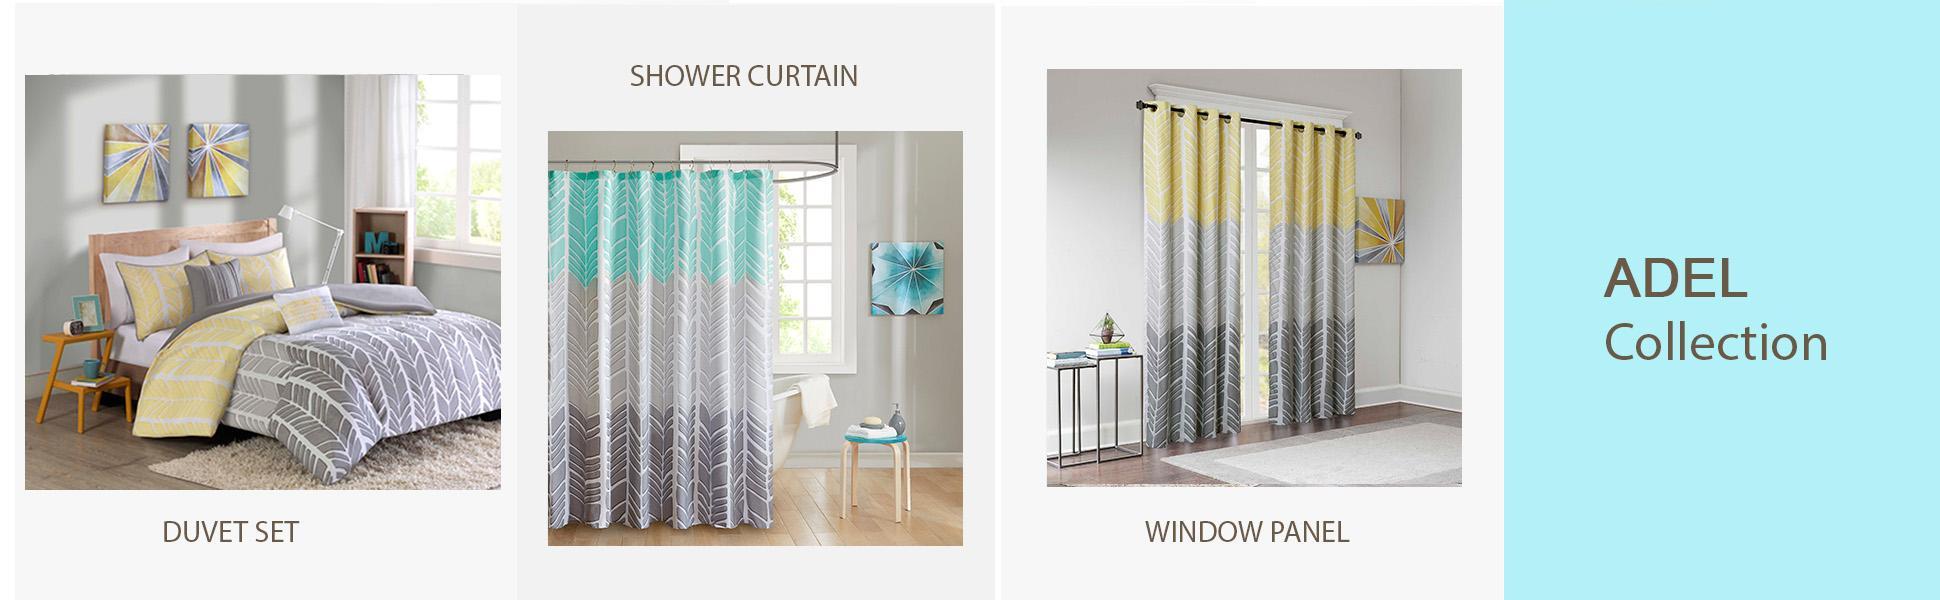 Amazon.com: Intelligent Design ID70790 Adel 100% Microfiber Printed Shower Curtain, 72 x 72